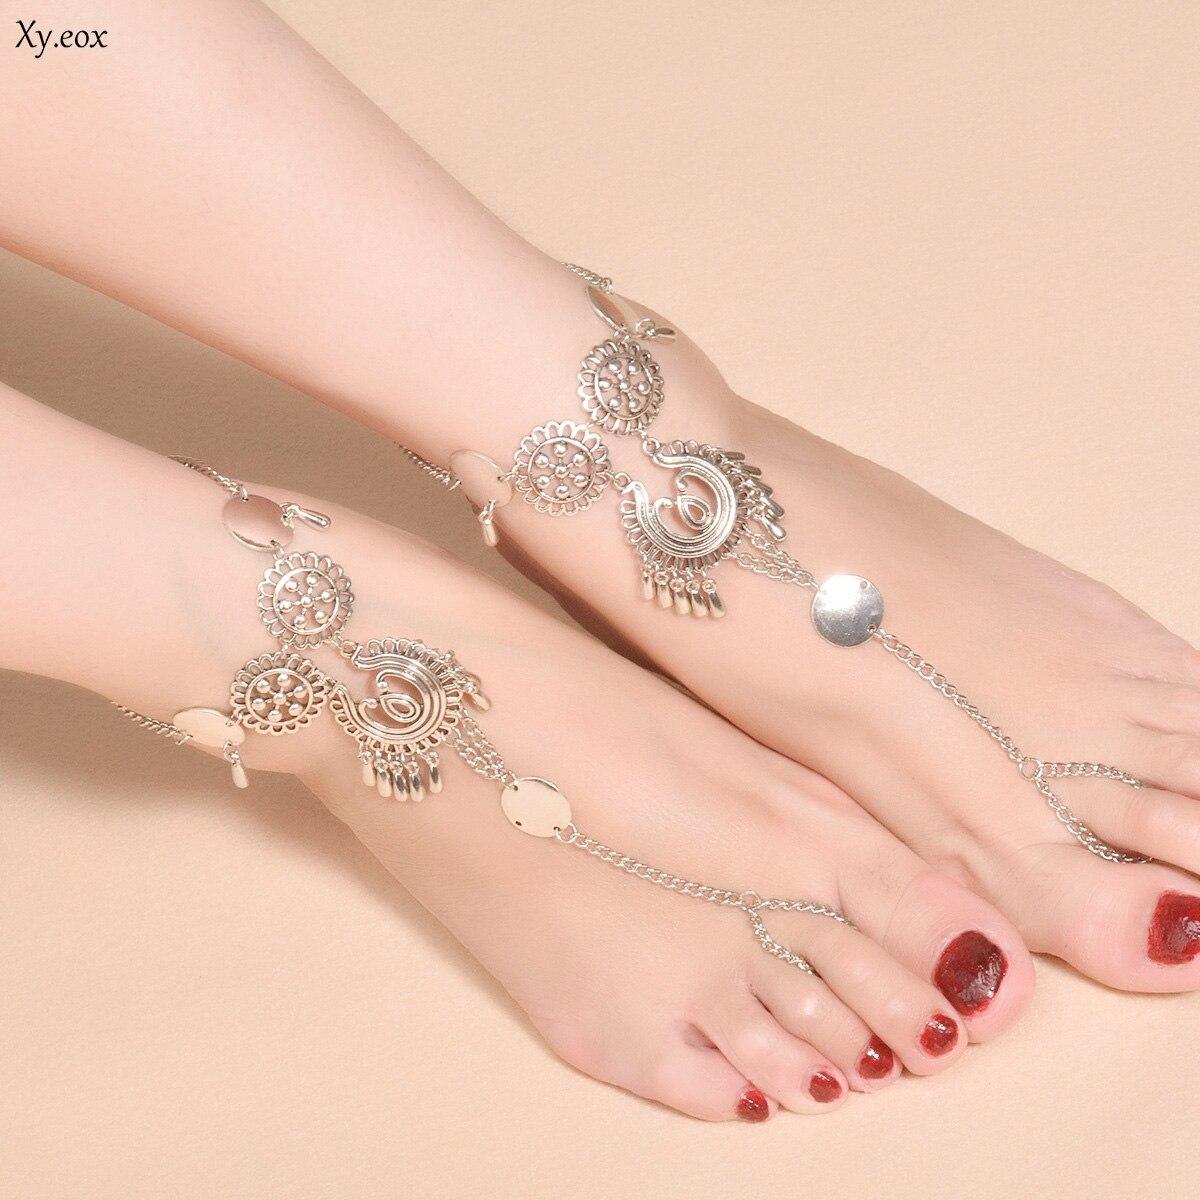 Moda aleación redonda flor dedo del pie anillo gota de agua tobillera con lentejuelas cadenas de pie